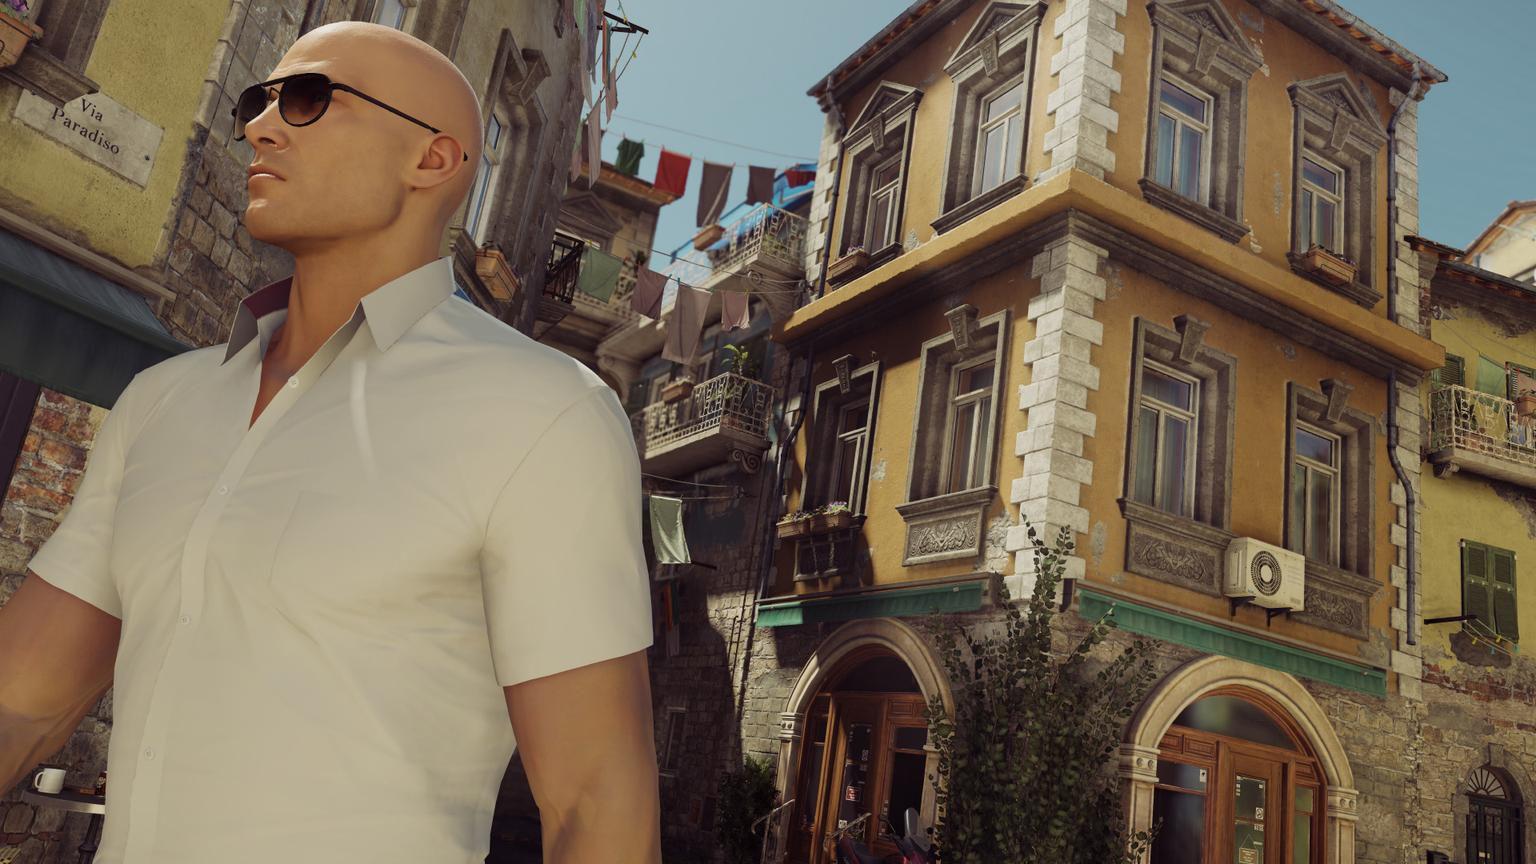 Hitman Episode 2 - Agent 47 in Sapienza streets